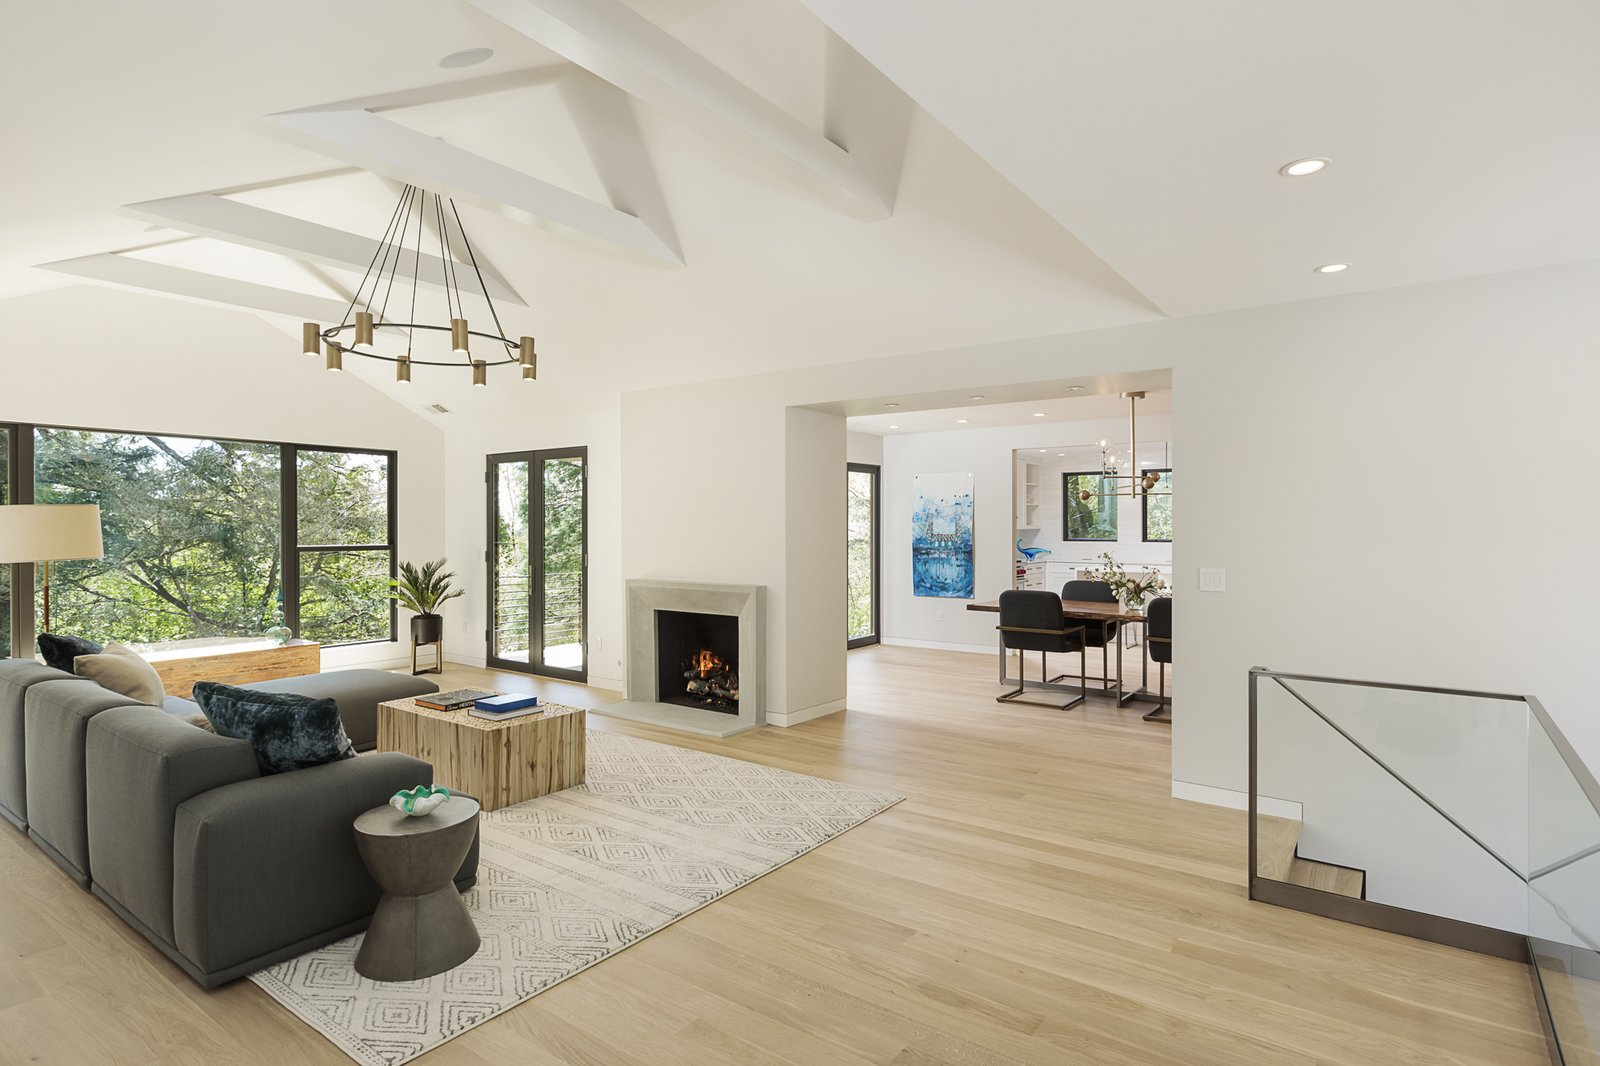 Living Room, Light Hardwood Floor, Recessed Lighting, Gas Burning Fireplace, and Ceiling Lighting  Burton House